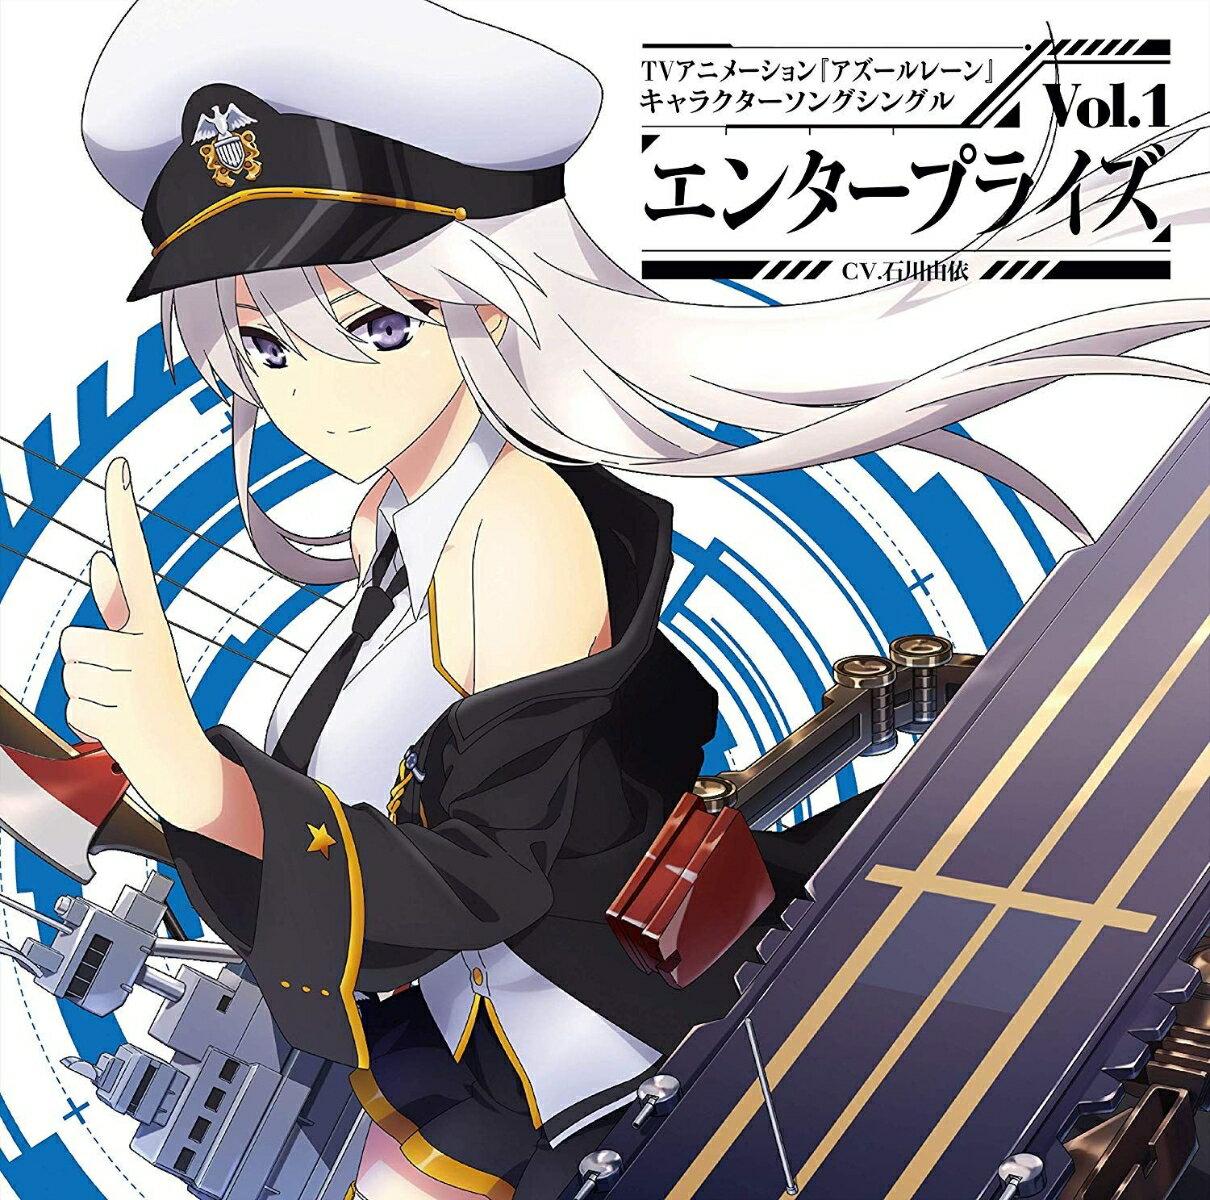 CD, アニメ TV Vol.1 (CV.)